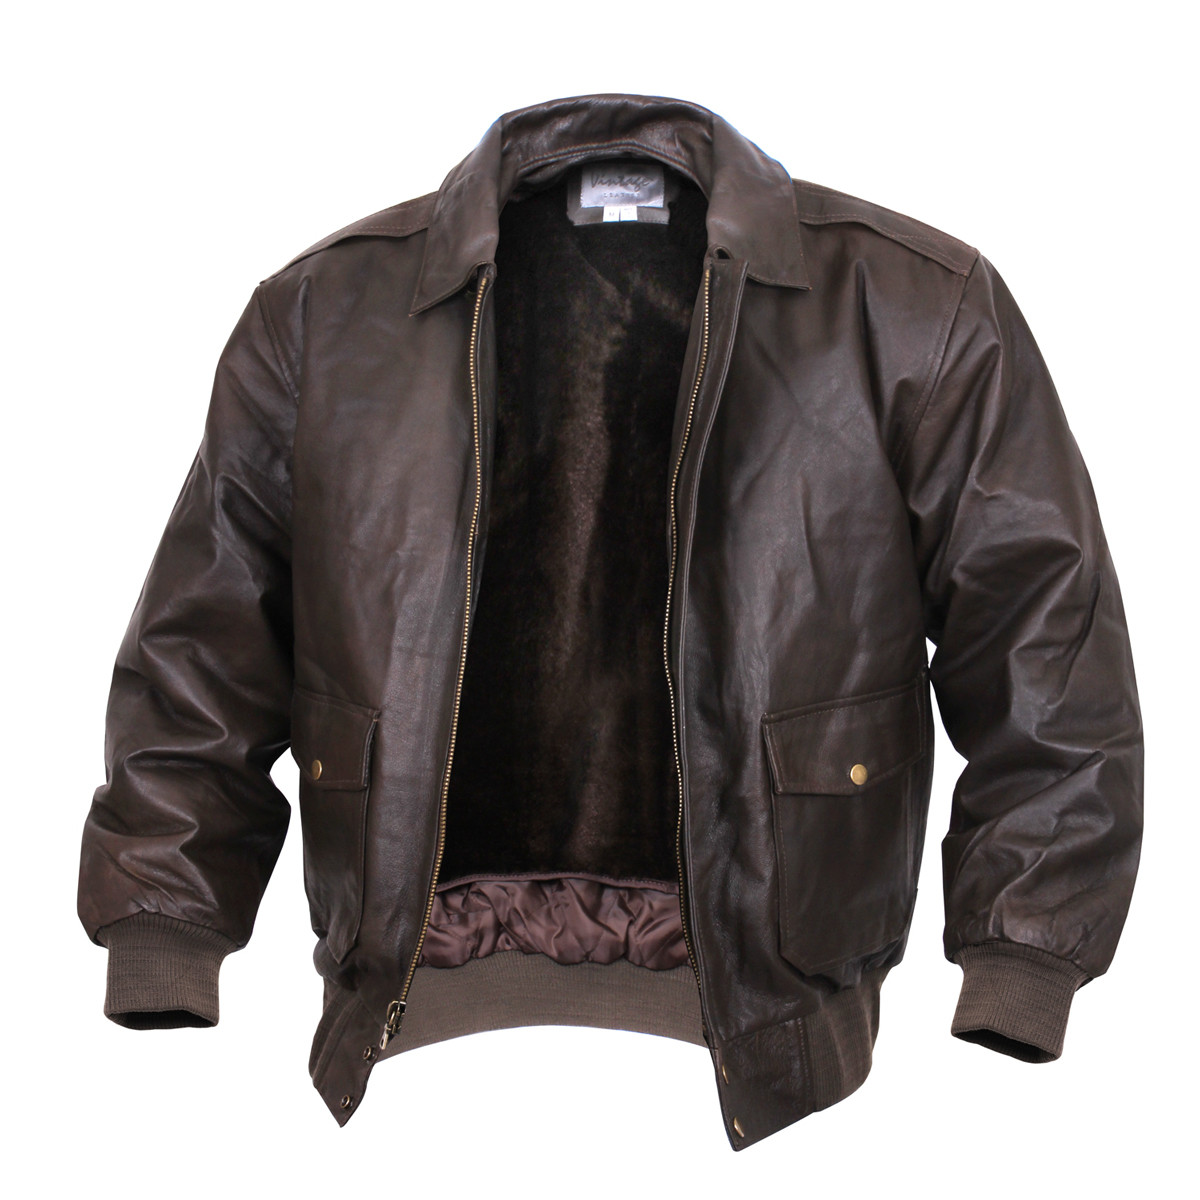 d472c281ec6 Shop Aviator Leather Flight Jackets - Fatigues Army Navy